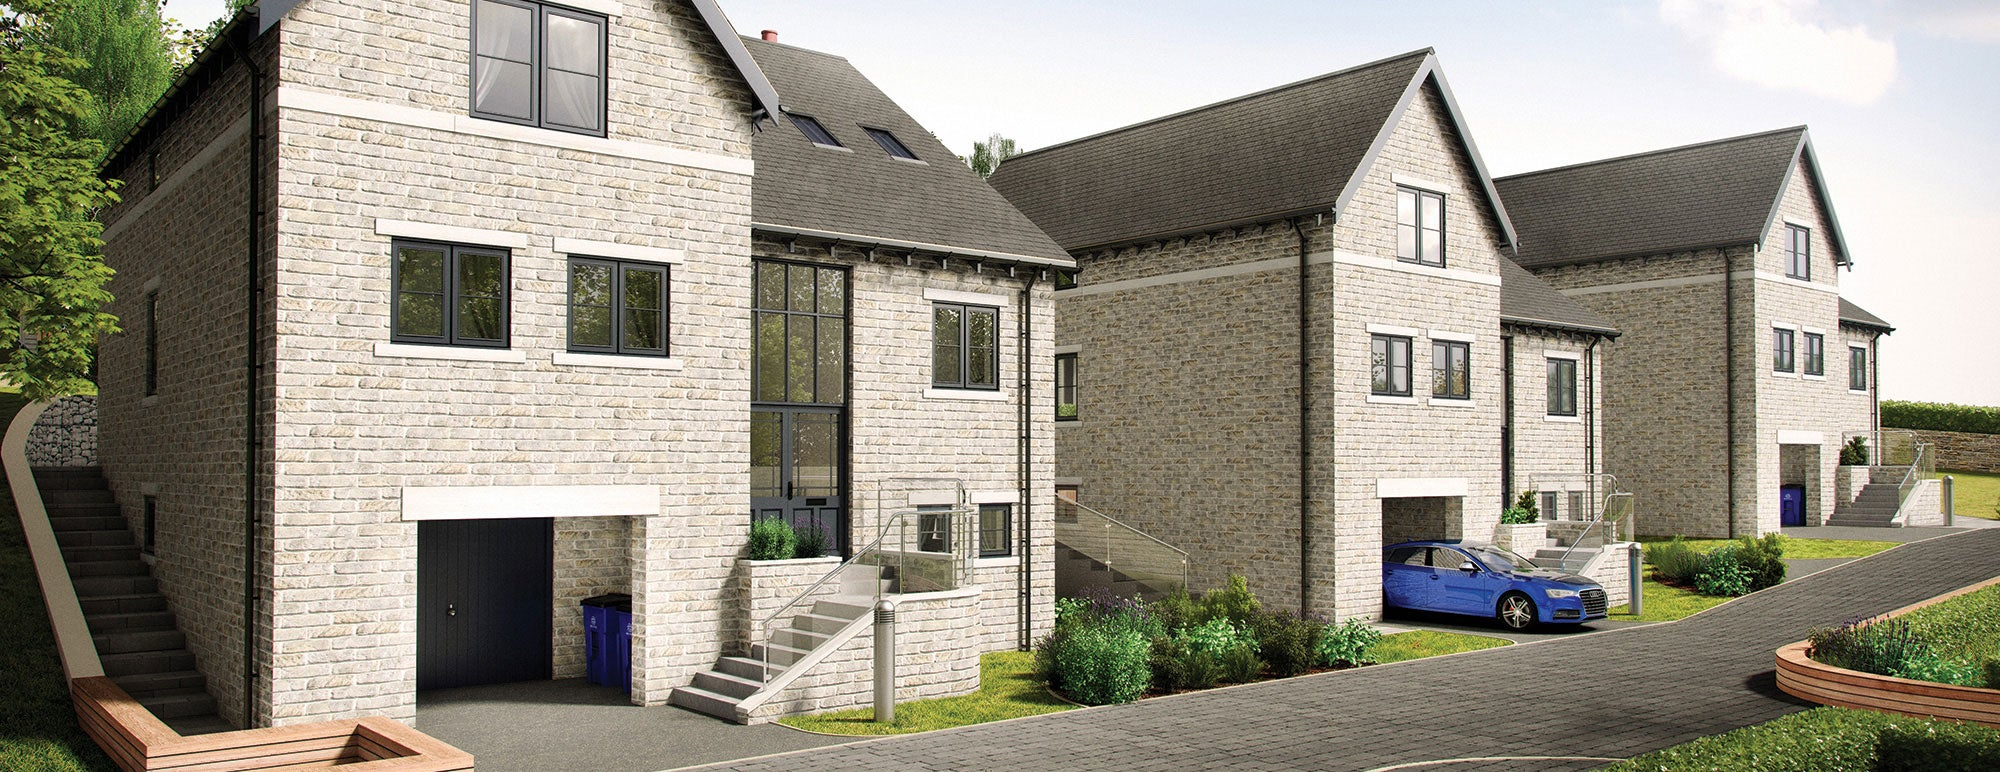 Matt Swain - Development - Moran Smart Homes